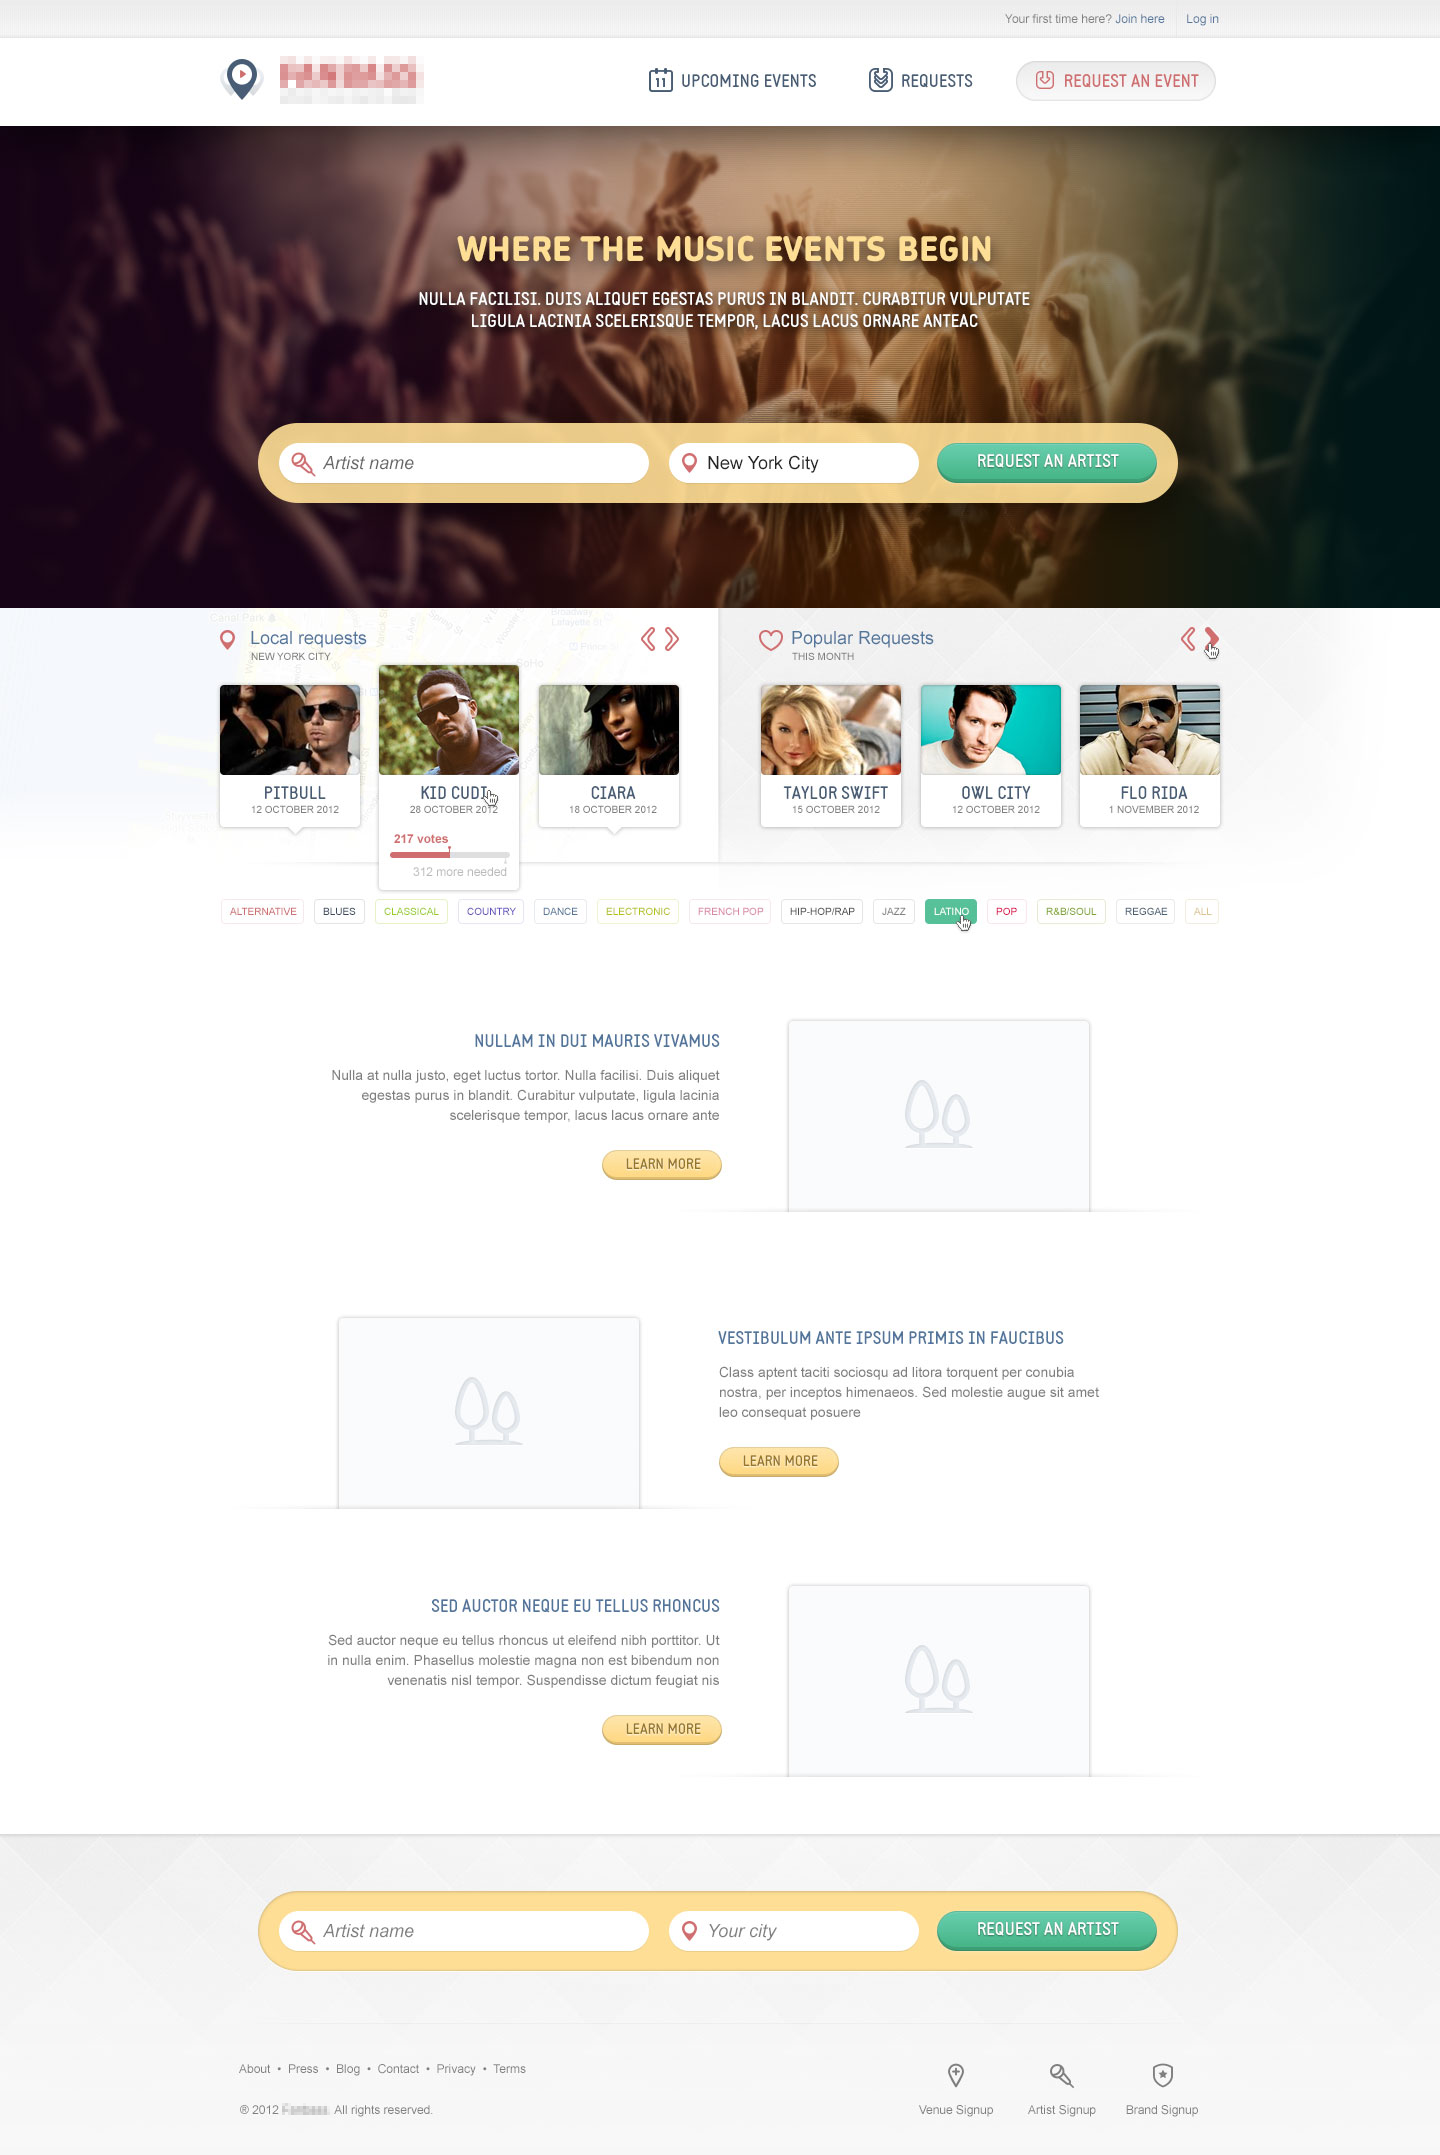 Web Design For Fanbass Music Web Design And Development By 3magine Web Design Web Development Responsive Web Landing Page Web Design Web Development Design